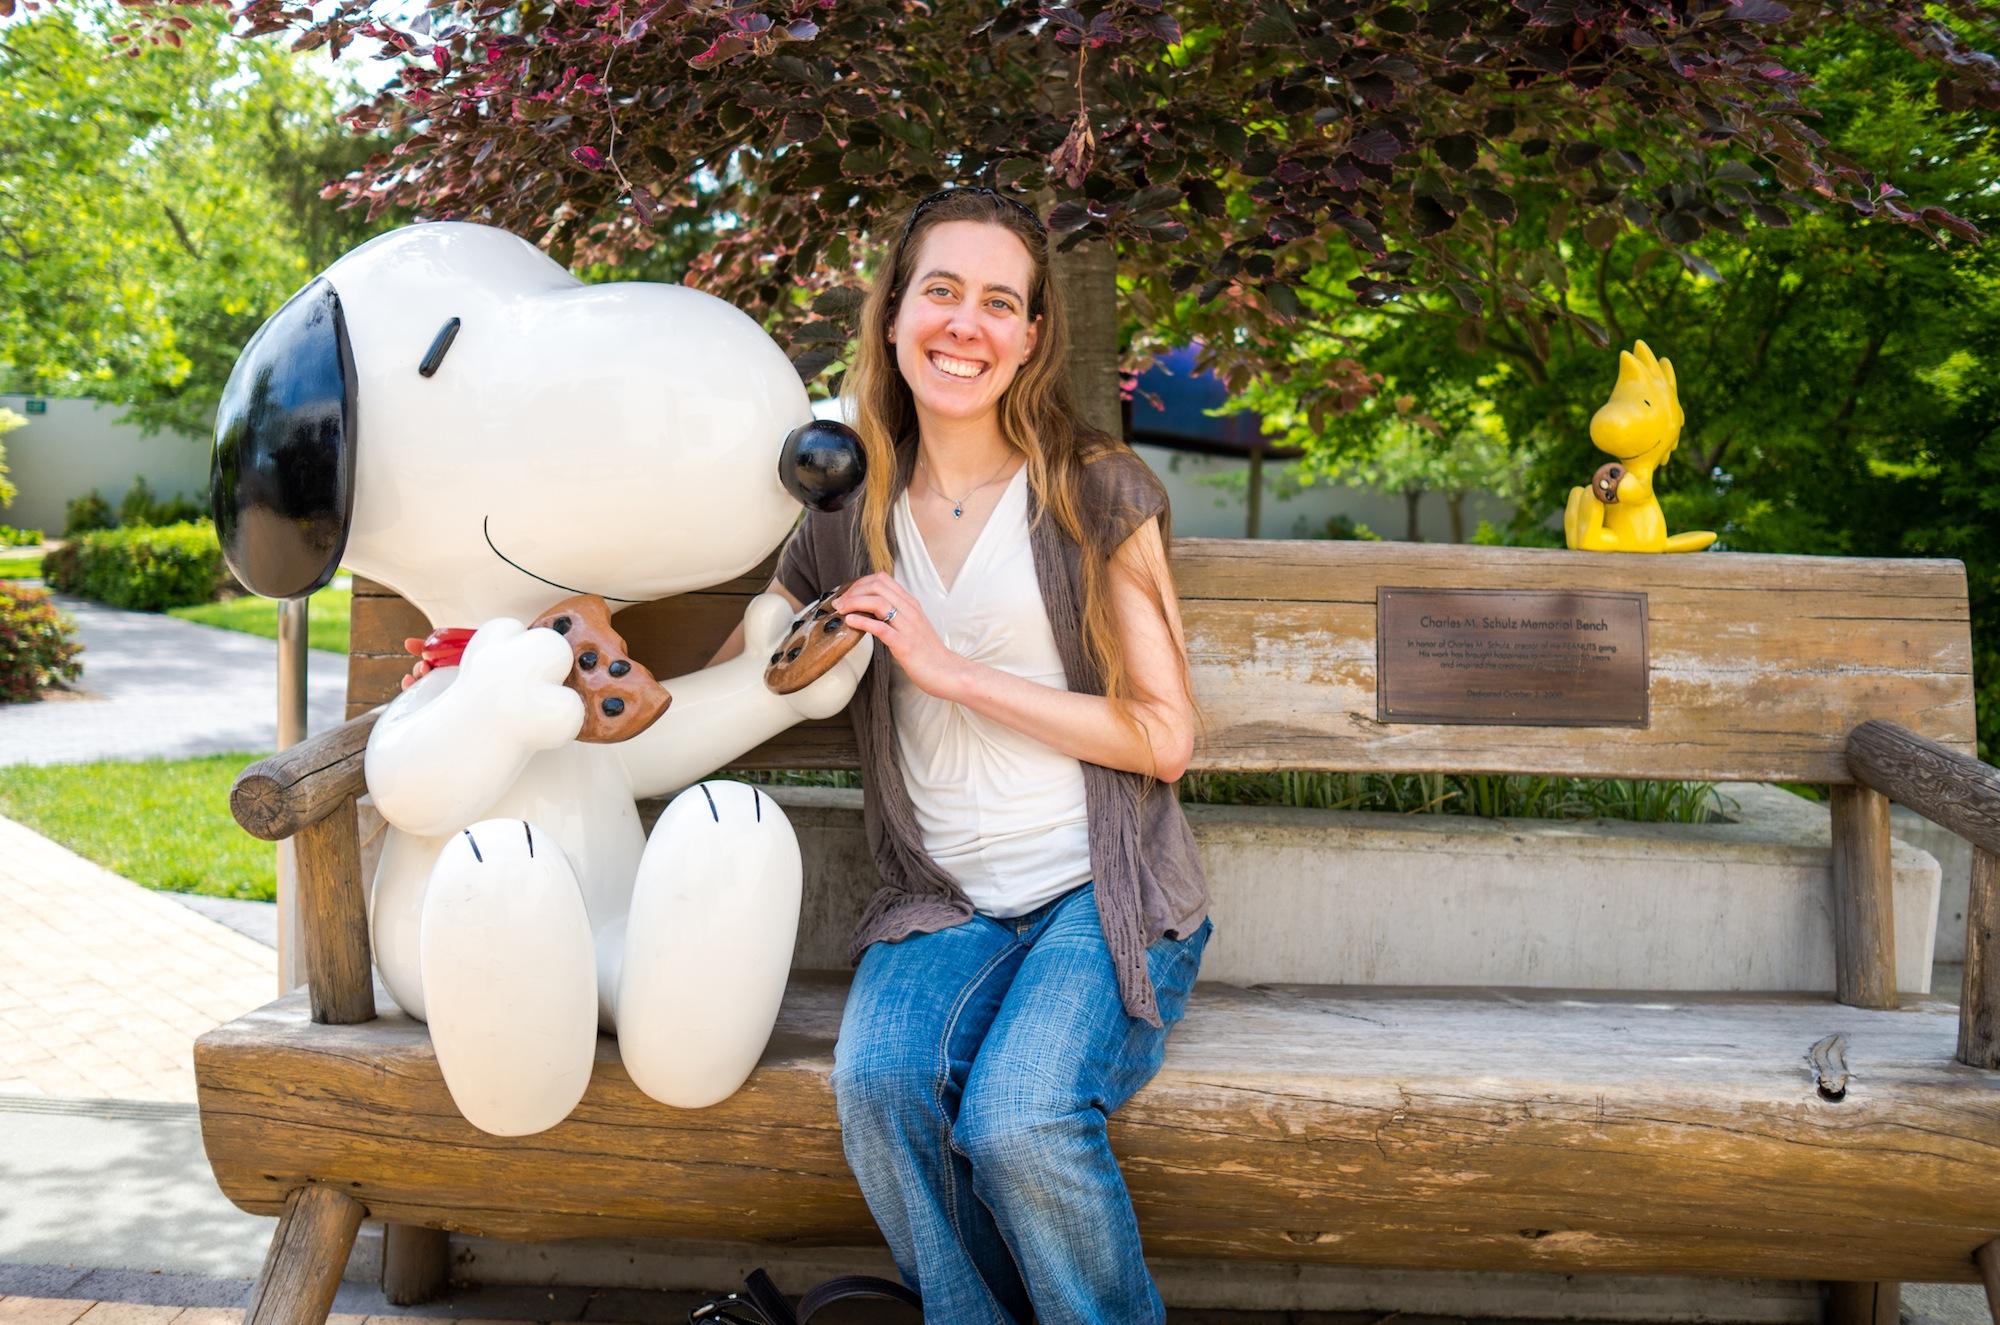 Kelley, Snoopy, & Woodstock